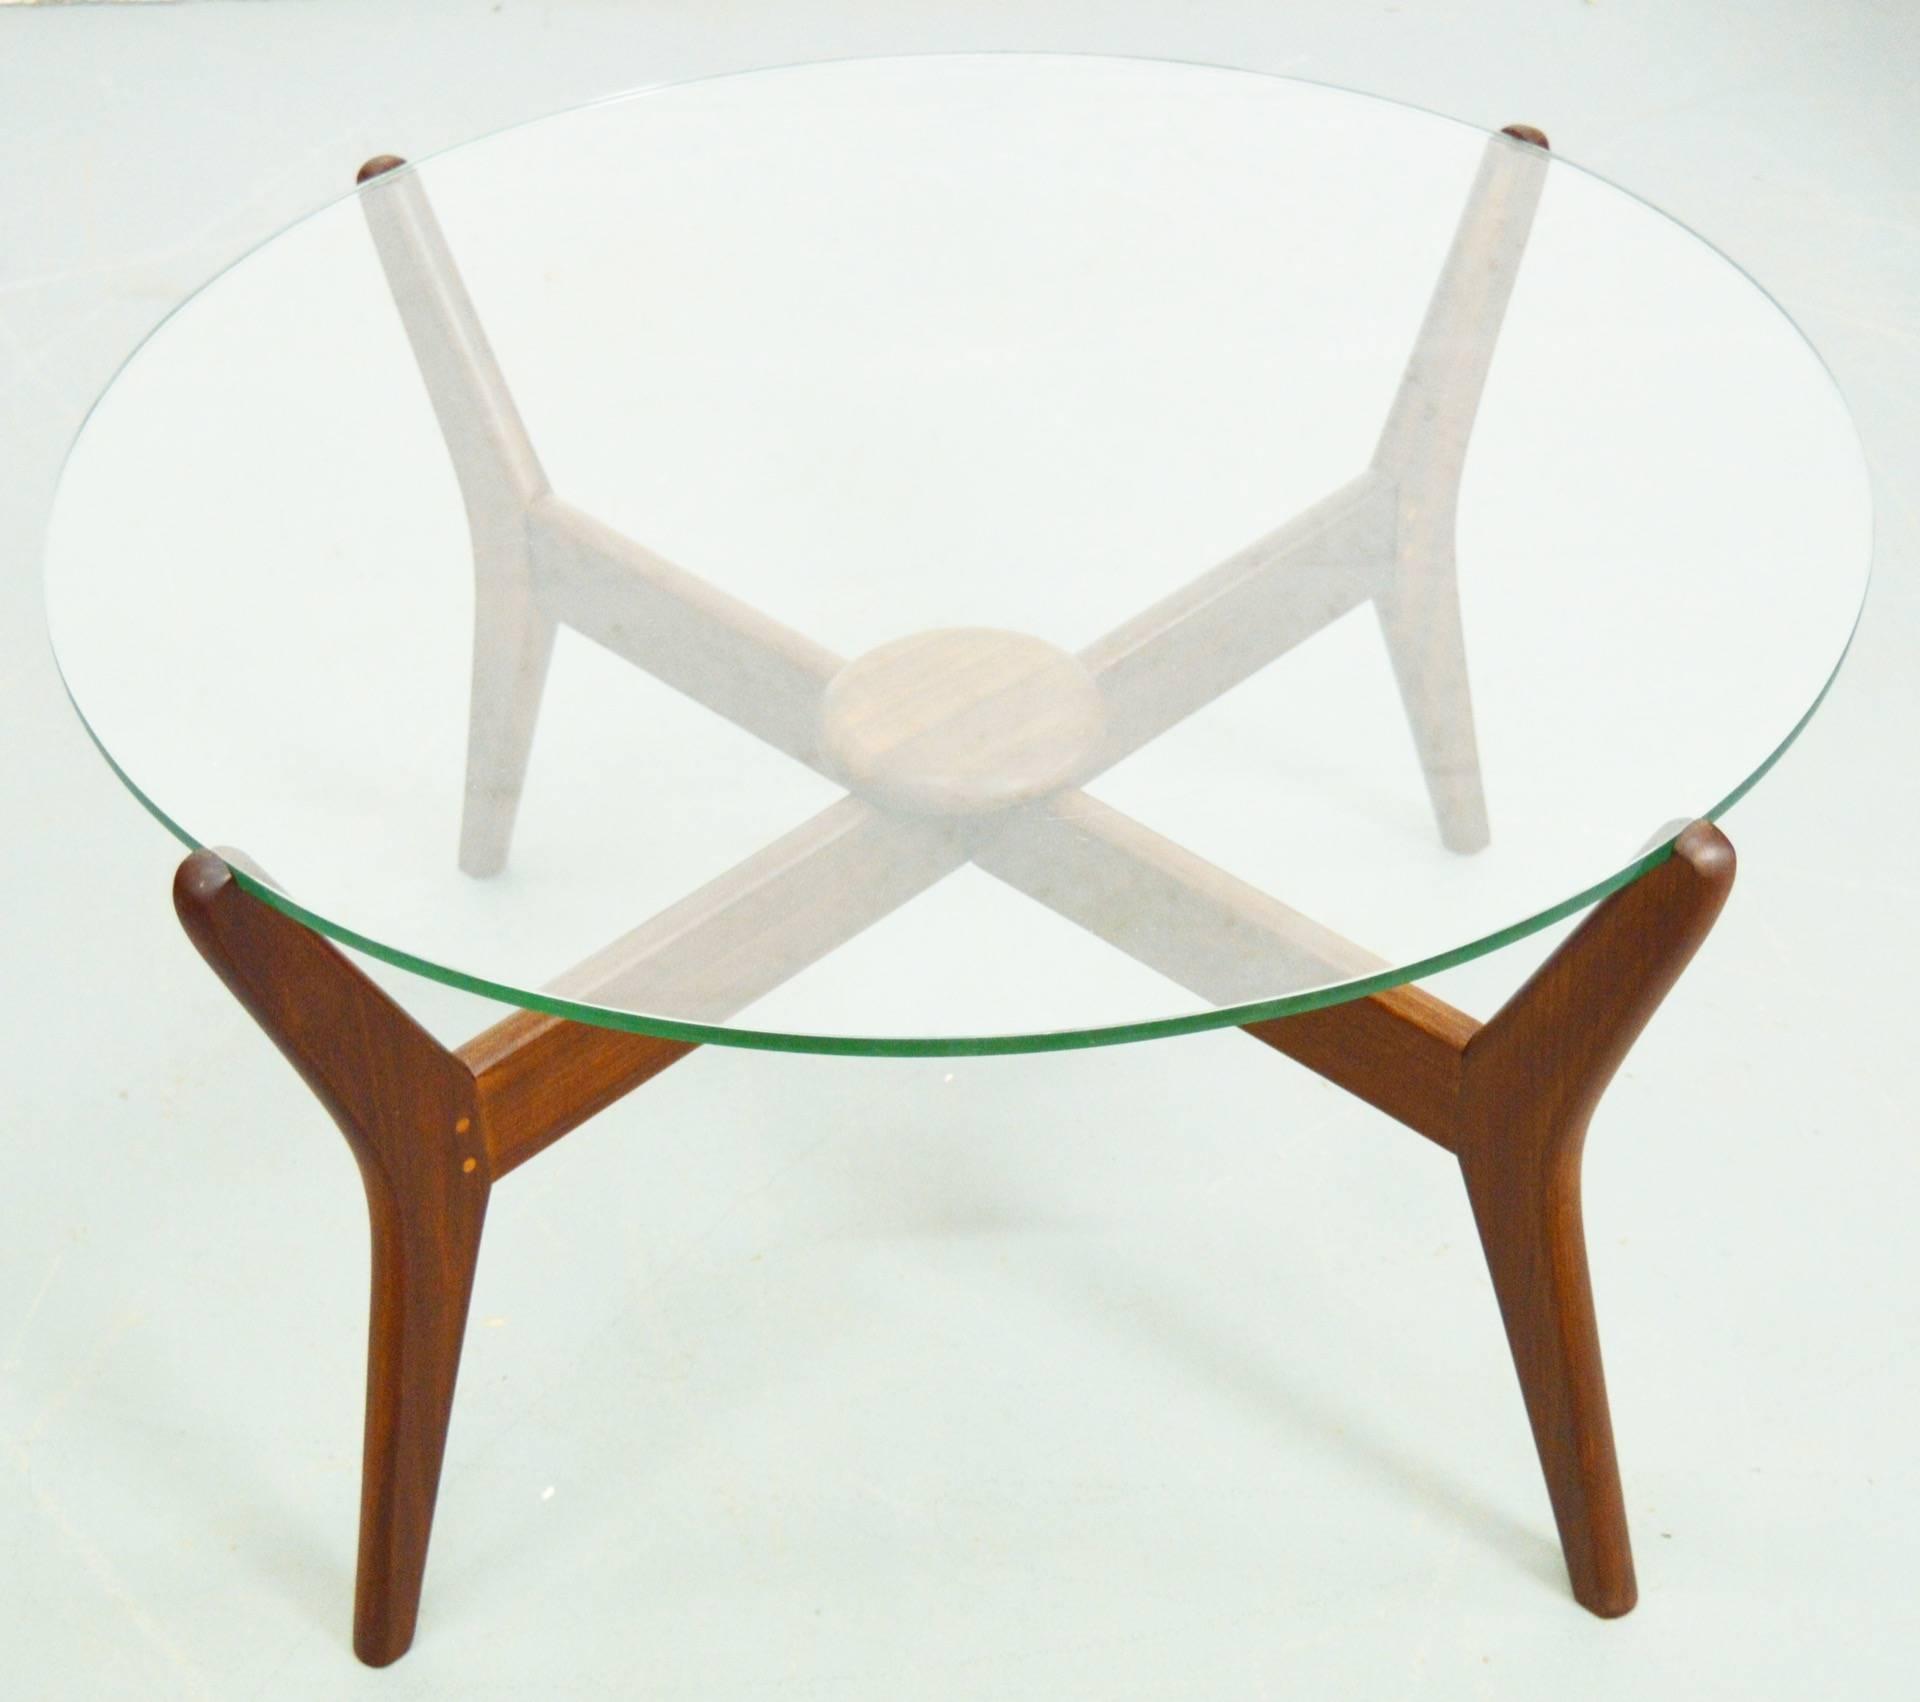 Mid Century Danish Teak Glass Top Coffee Table | Vinterior With Regard To Retro Teak Glass Coffee Tables (View 10 of 30)